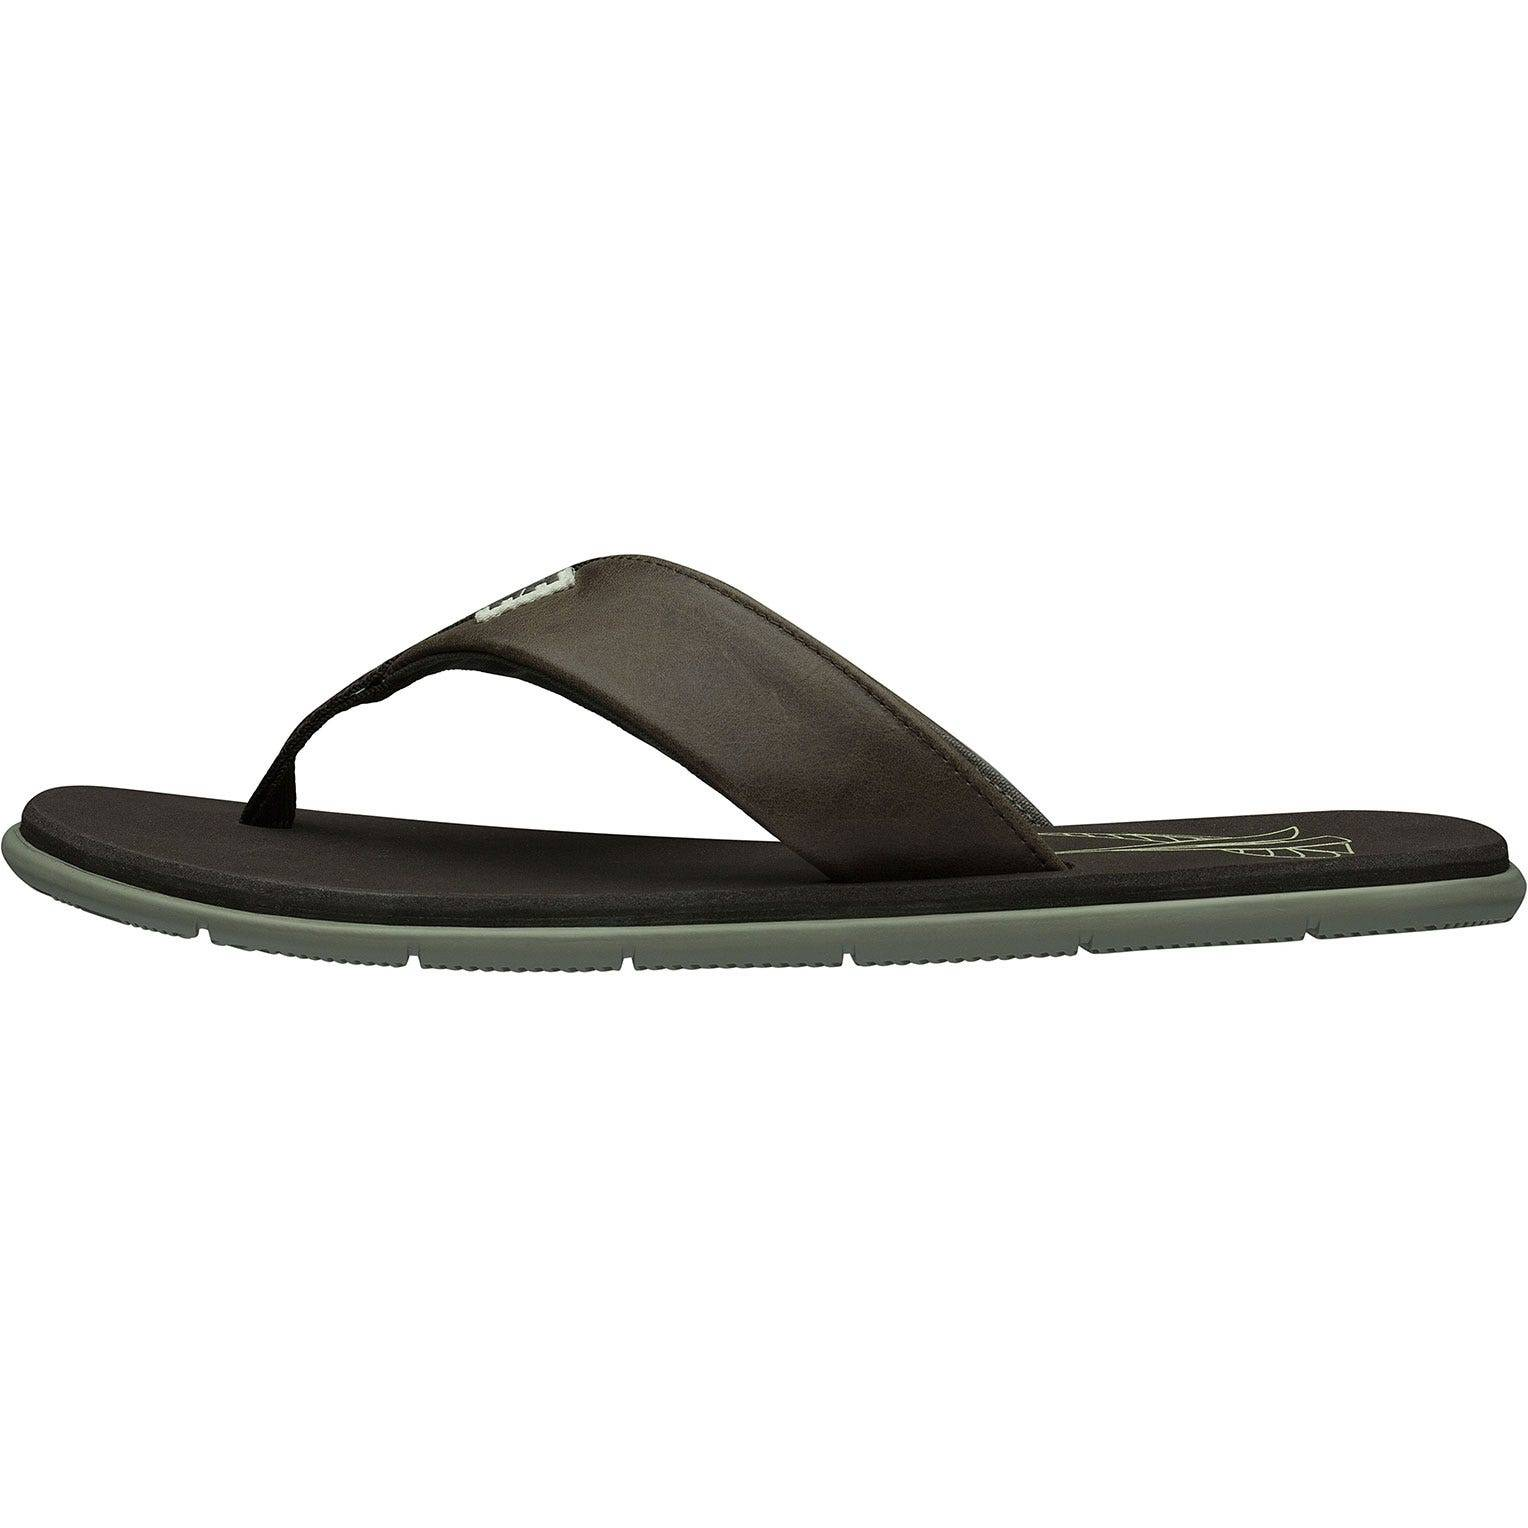 Helly Hansen W Seasand Leather Sandal Womens Brown 39.3/8